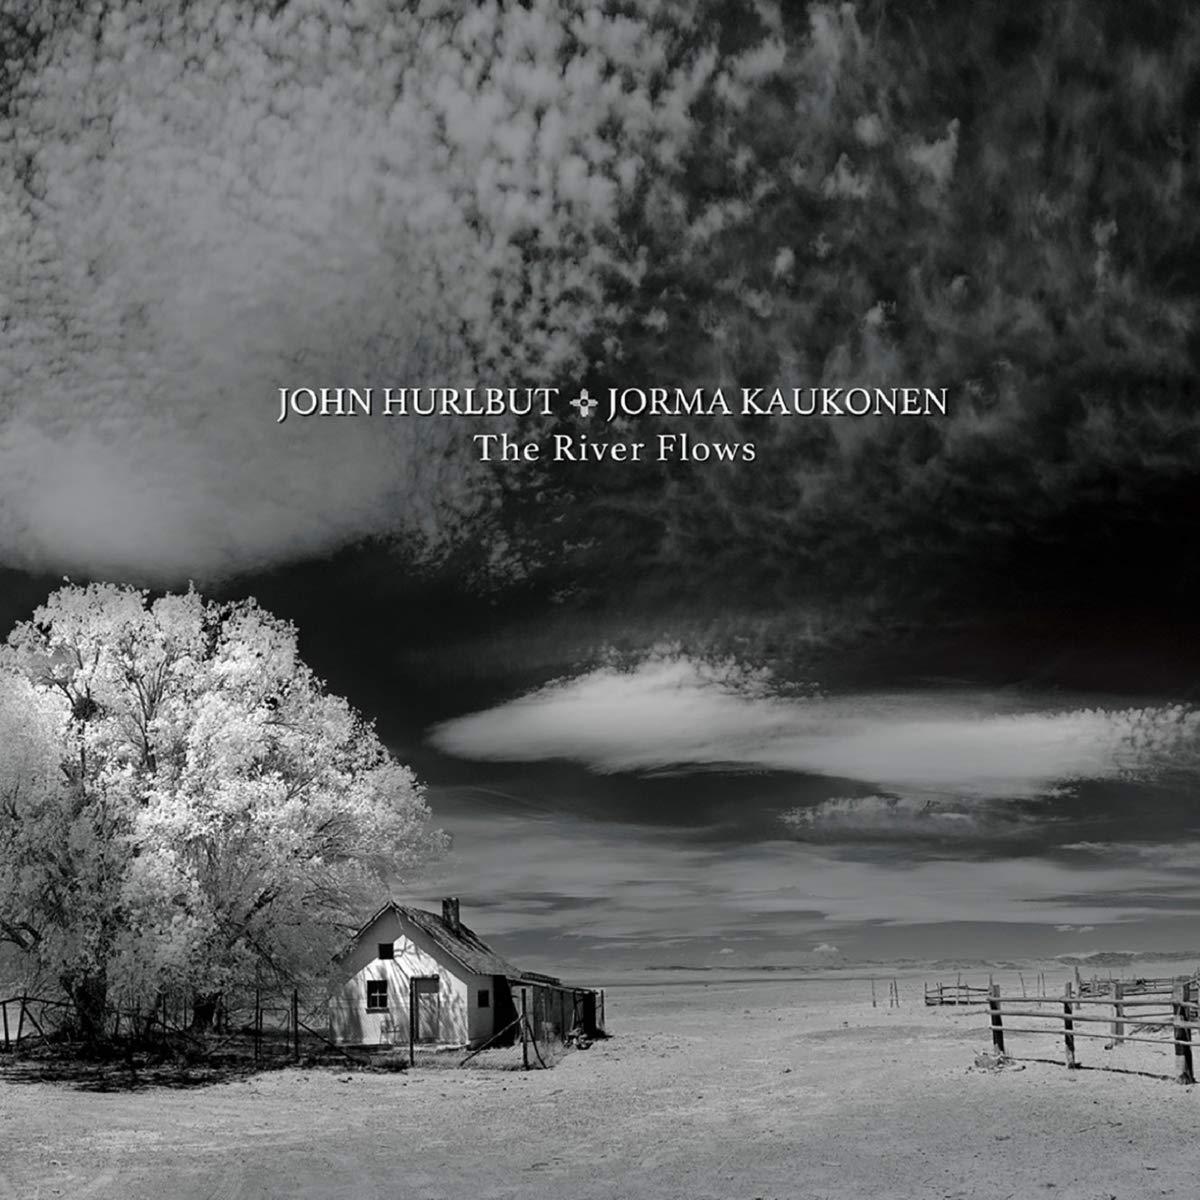 Jorma Kaukonen and John Hurlbut: The River Flows